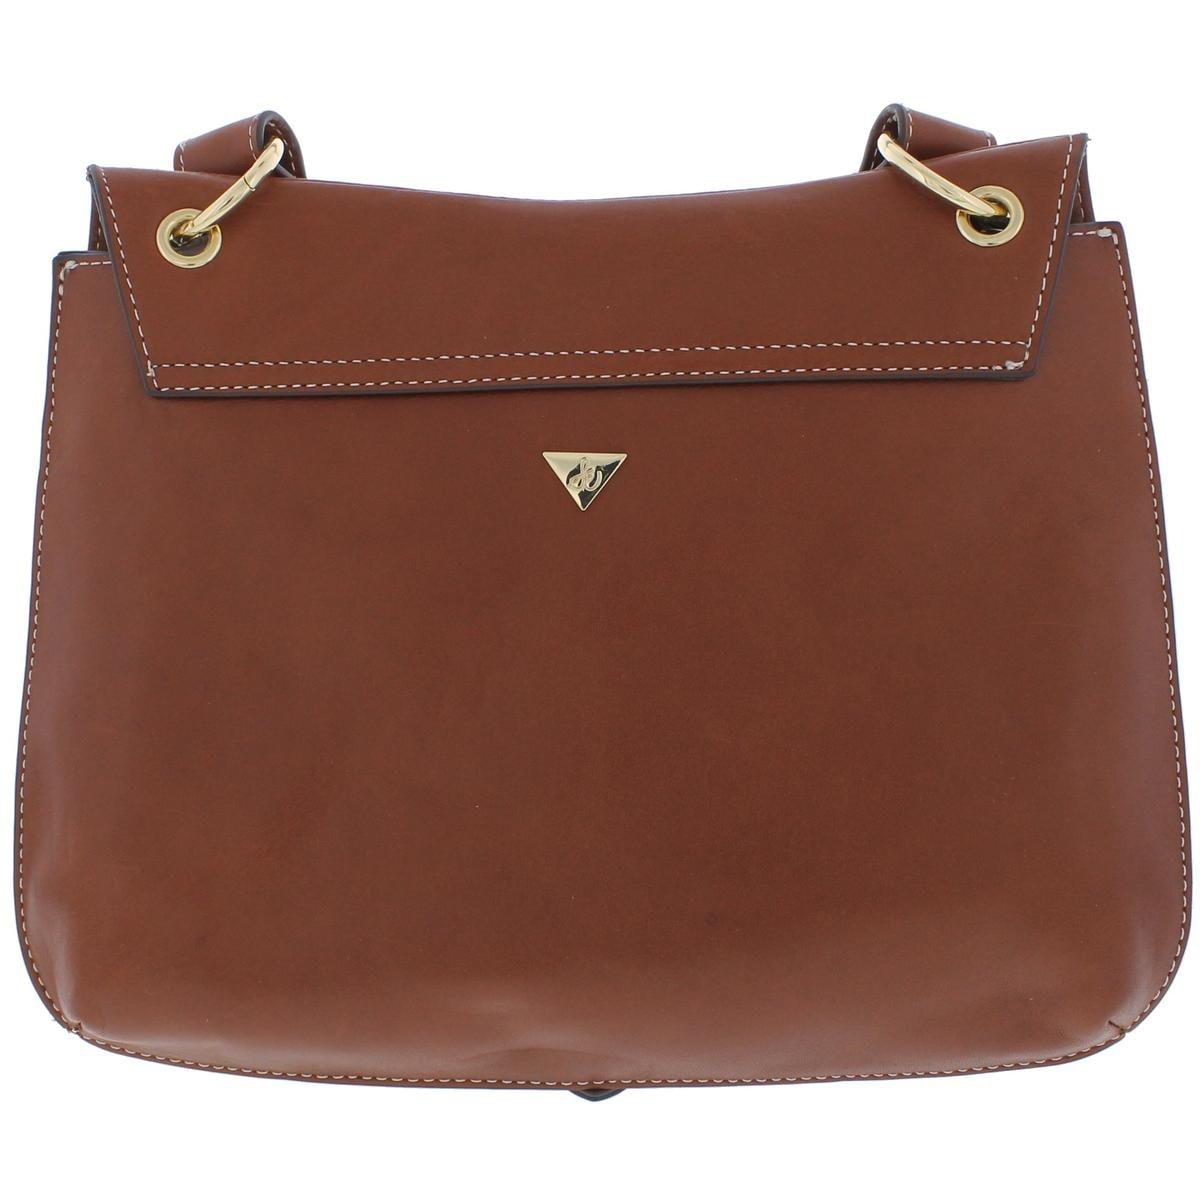 3d7ea92671165a Shop Sam Edelman Womens Delilah Saddle Handbag Leather Crossbody - Medium -  Free Shipping Today - Overstock - 21009491